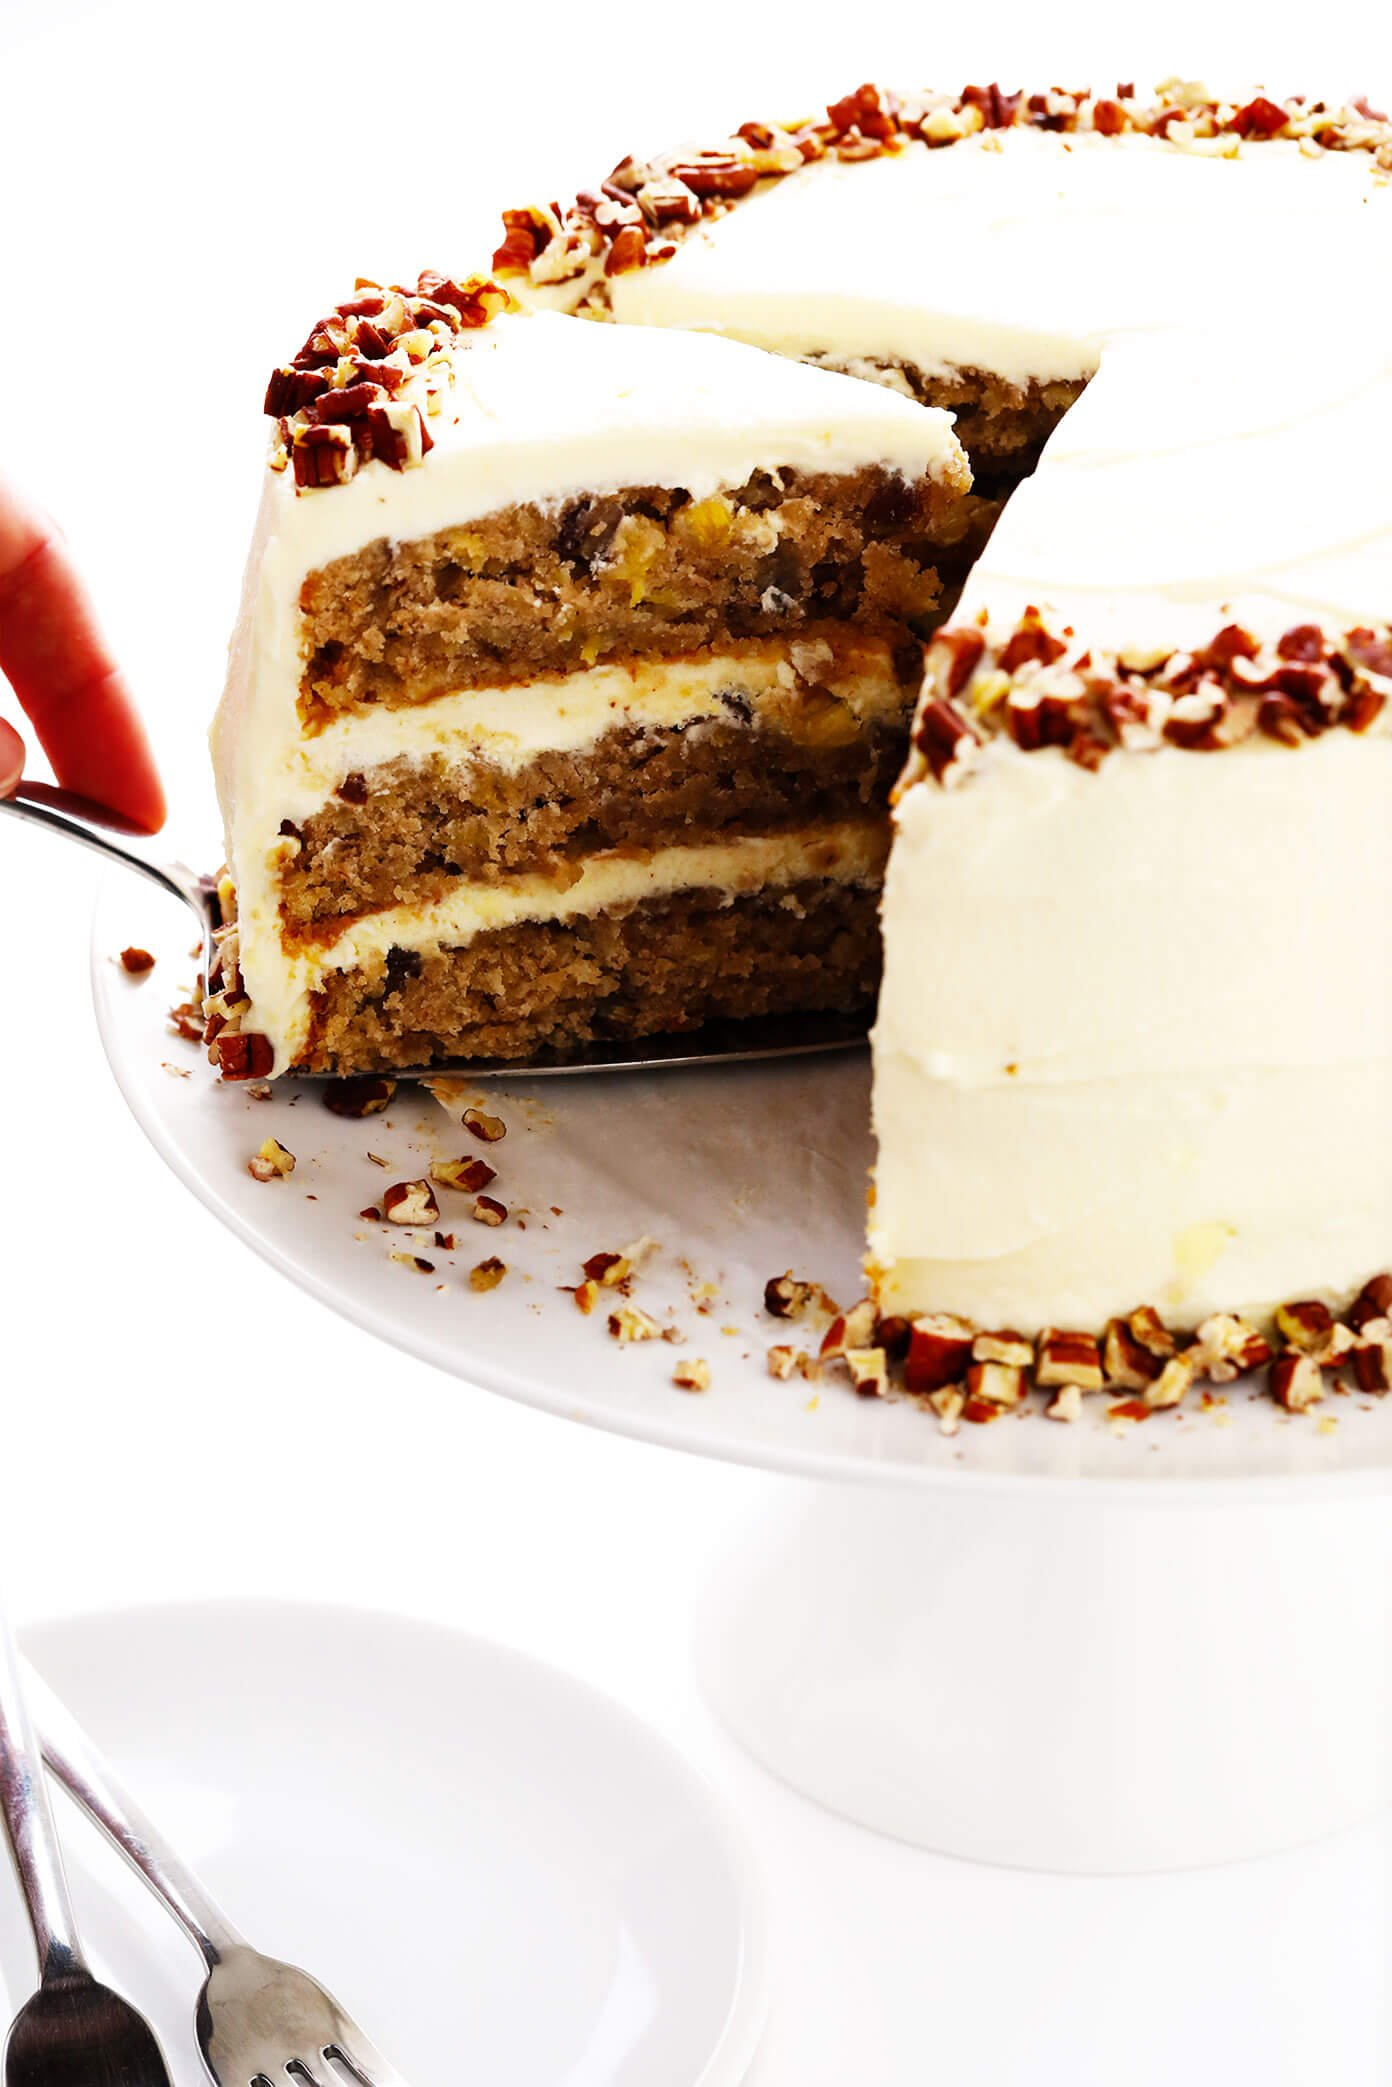 Cutting a slice of hummingbird cake